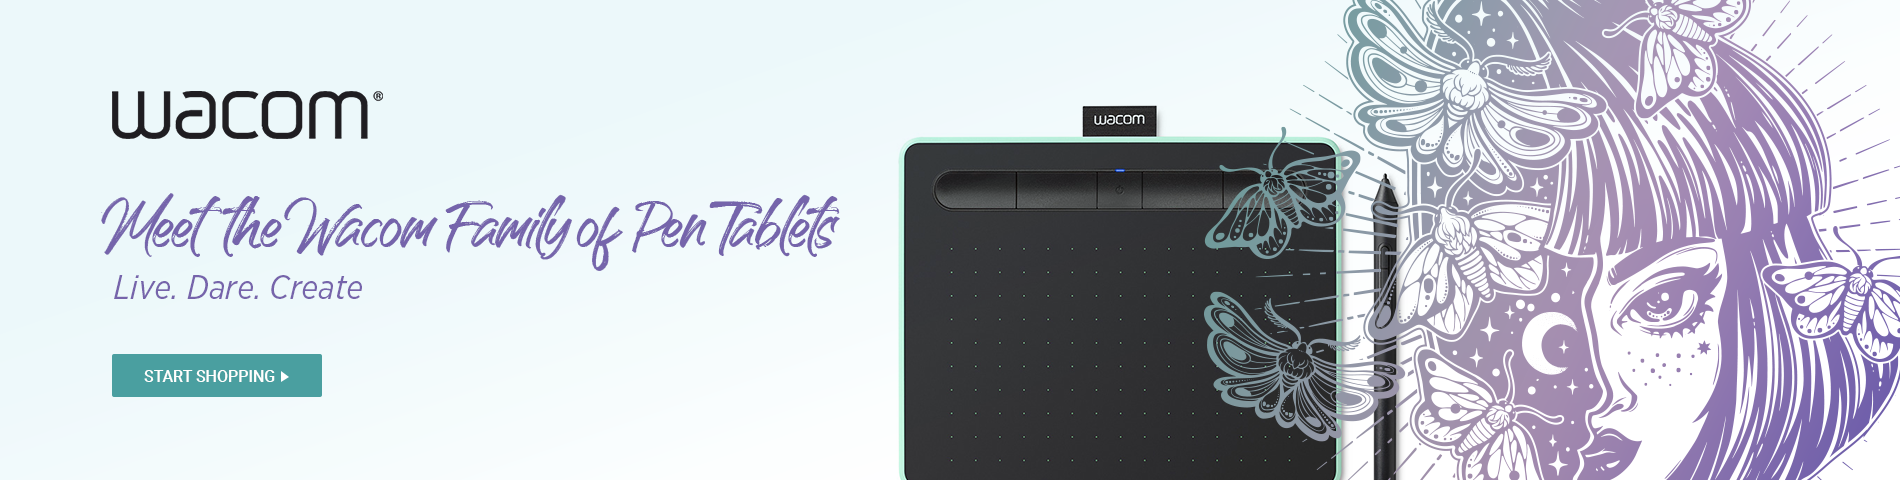 Wacom Intuos Pen Tablets